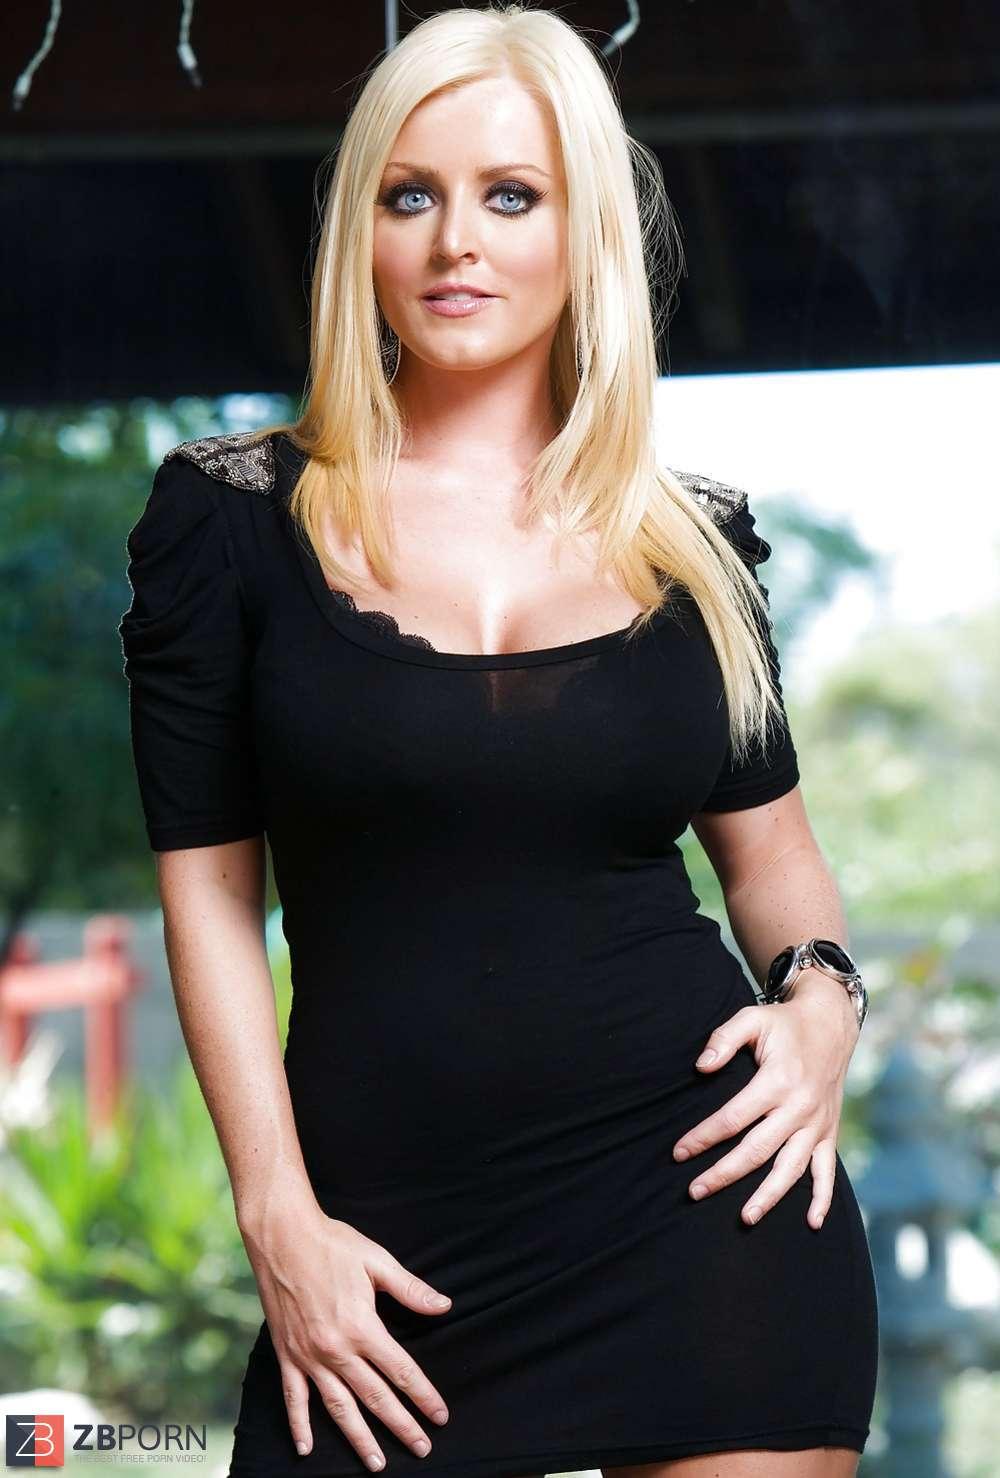 British Phat Ass White Girl Sophie Dee - SurlyD!! / ZB Porn